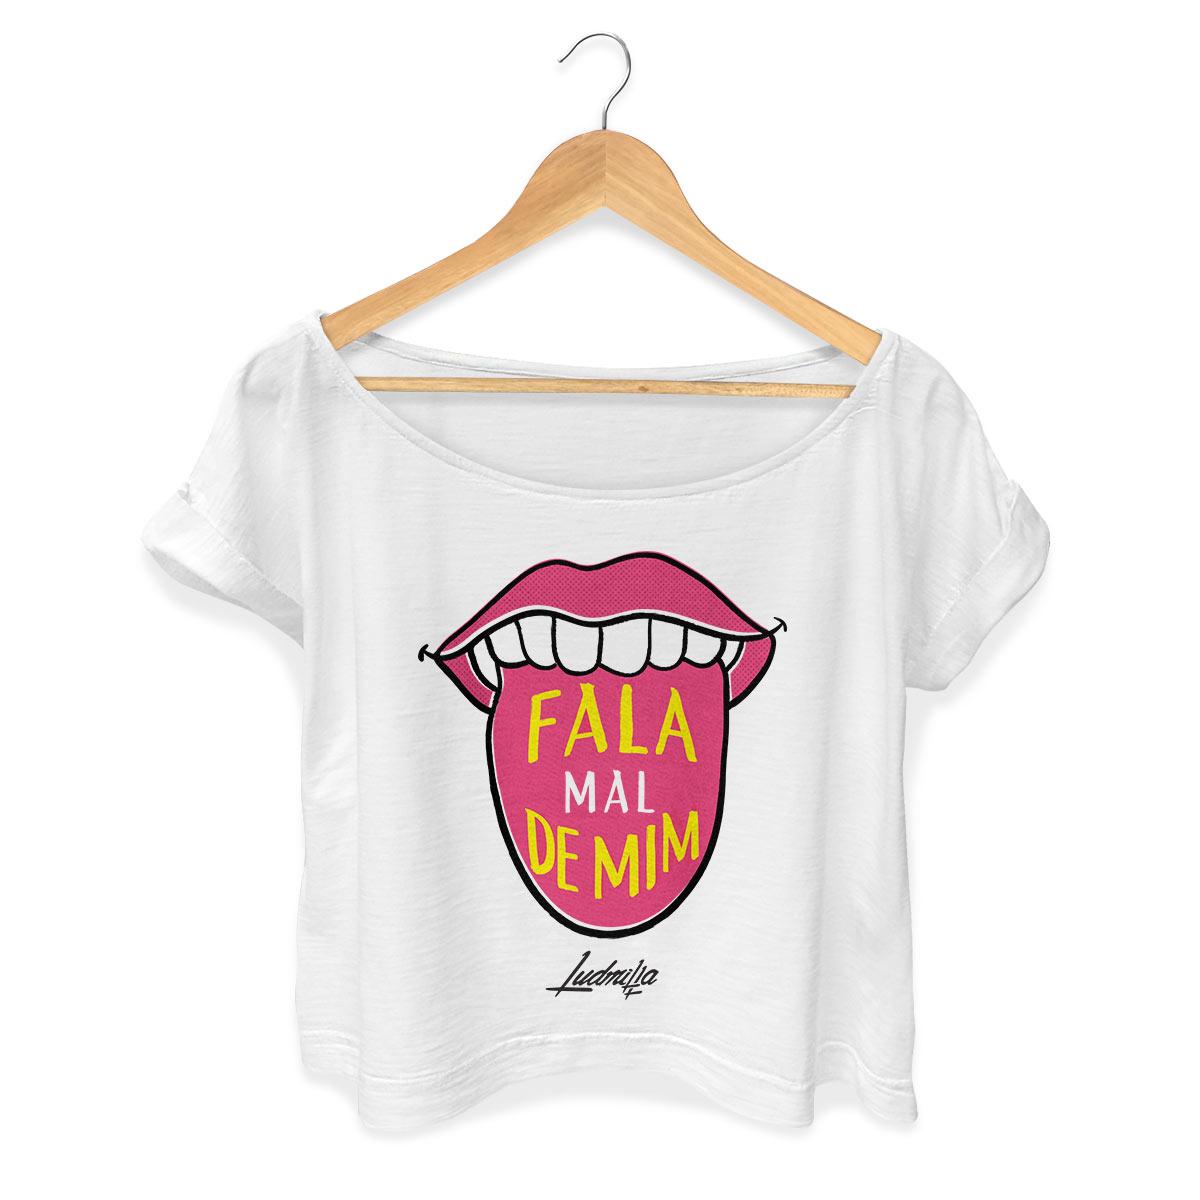 T-shirt Premium Feminina Ludmilla Fala Mal de Mim